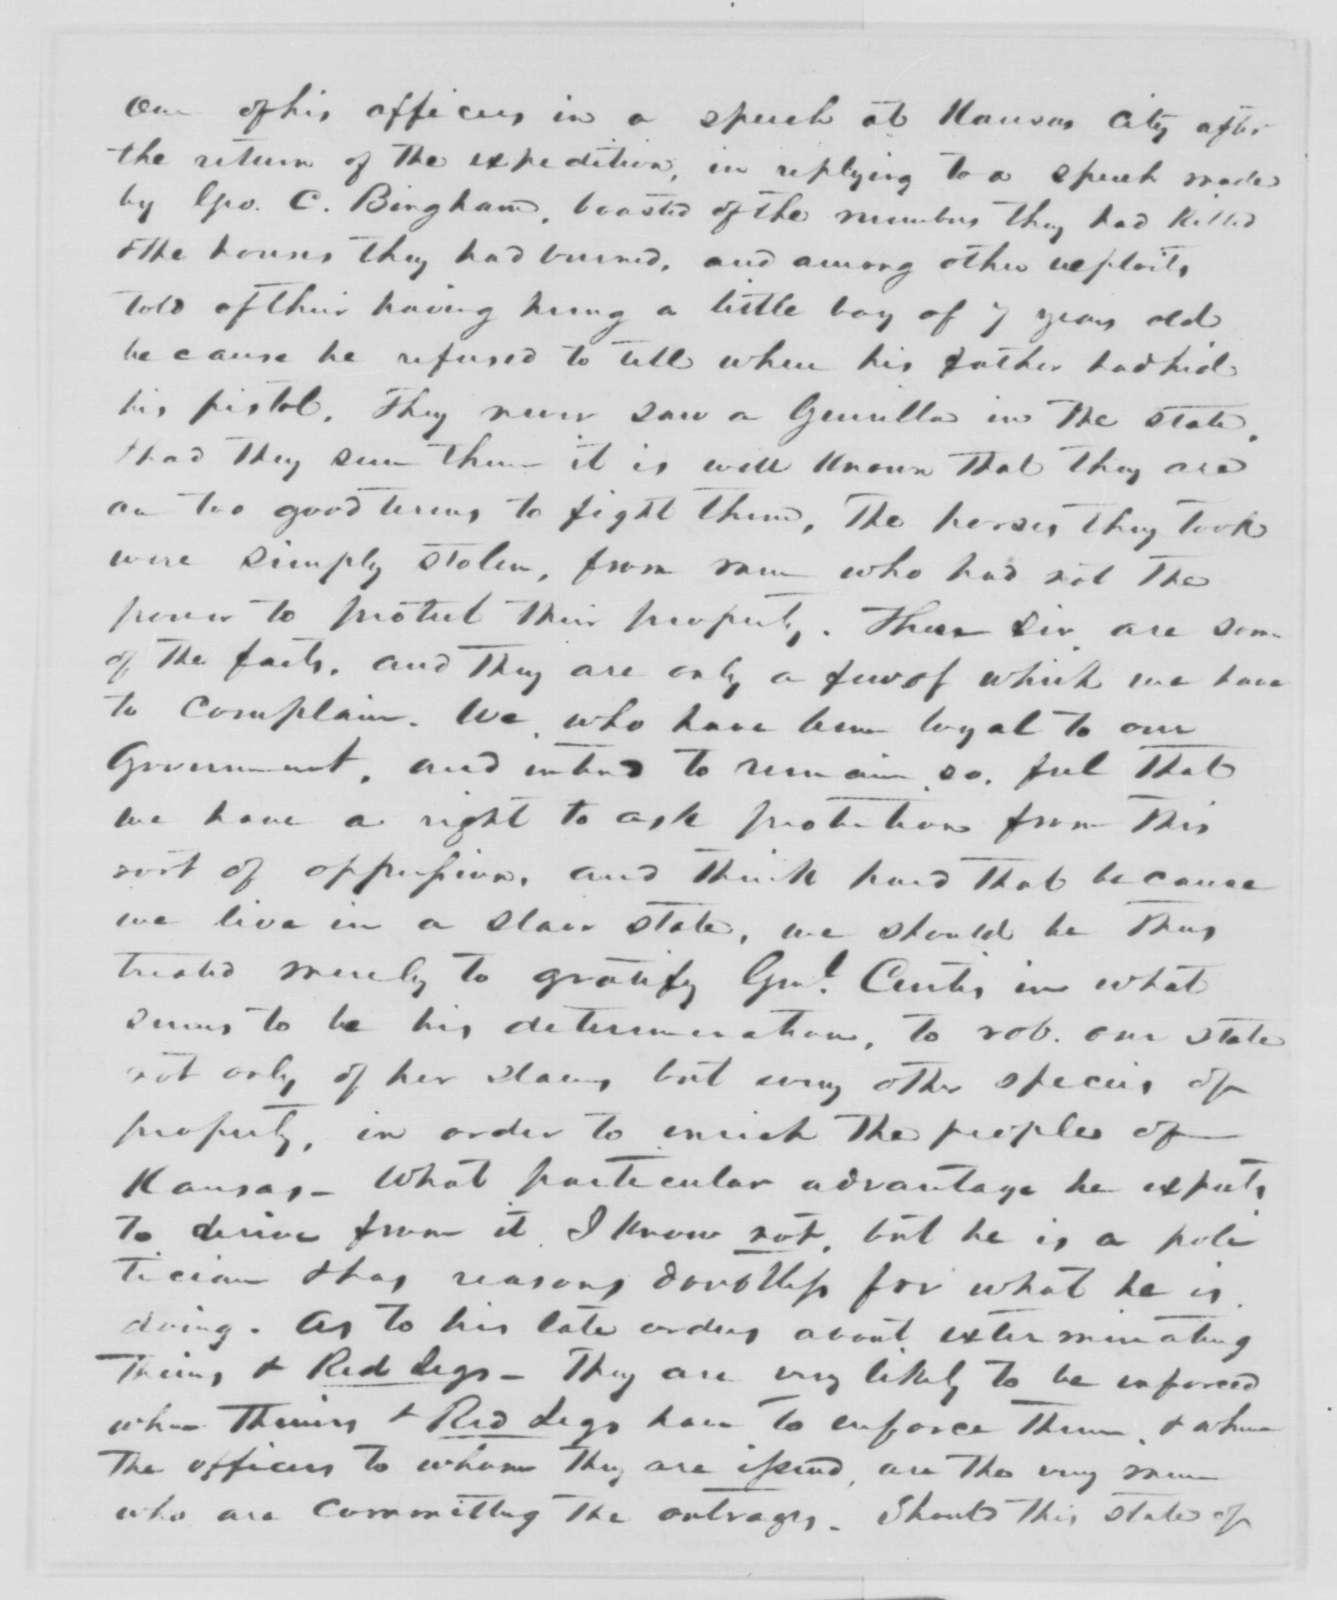 R. C. Vaughan to James O. Broadhead, April 31, 1863  (Affairs in Missouri; endorsed by John F. Ryland)